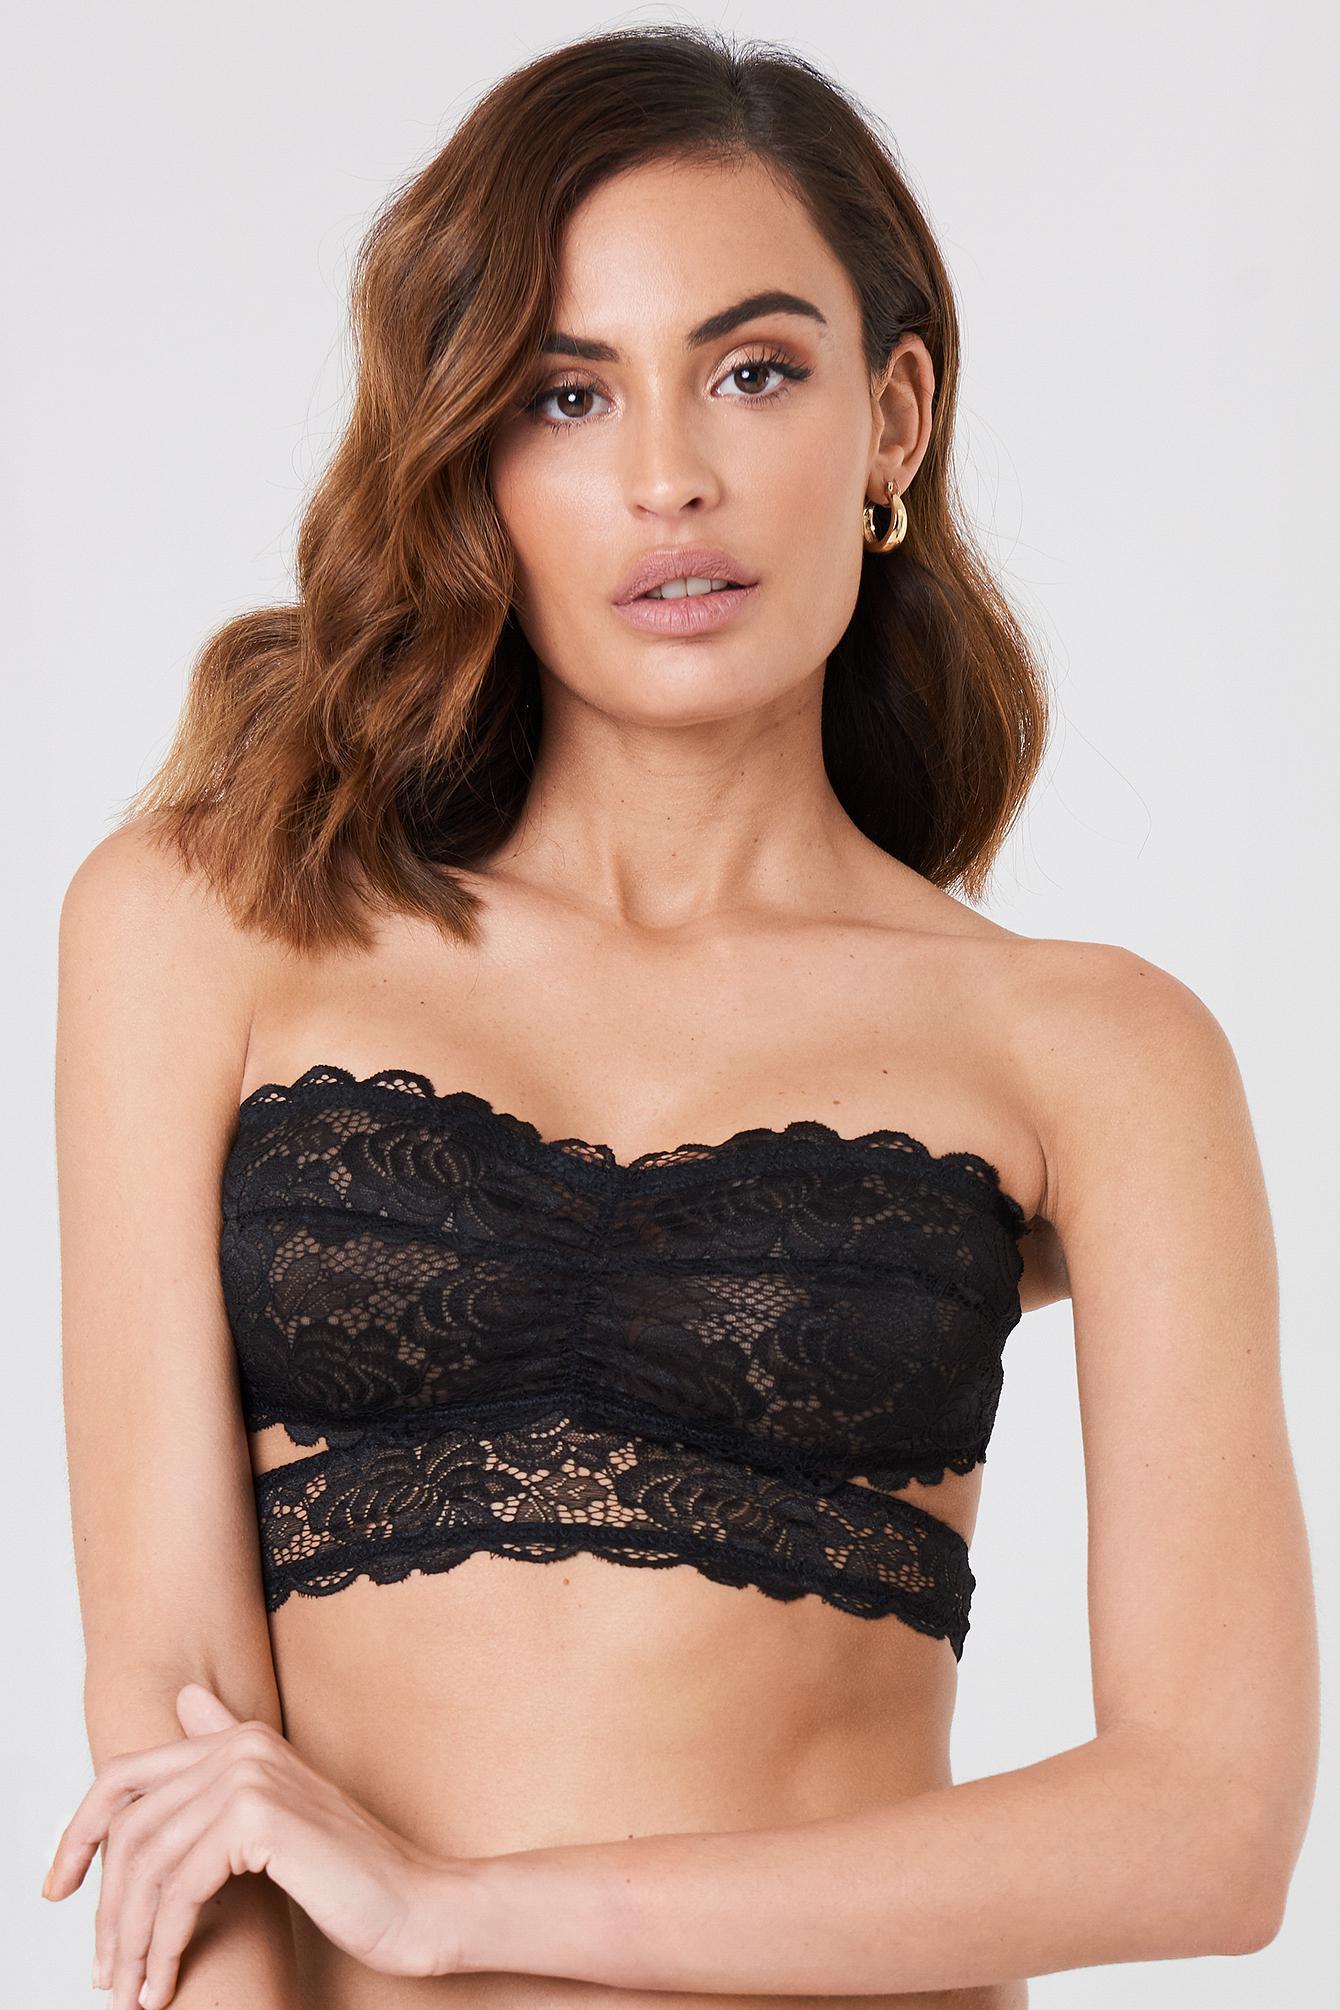 f2a05853419 NA-KD Lace Strap Bandeau Bra Black in Black - Save 56% - Lyst